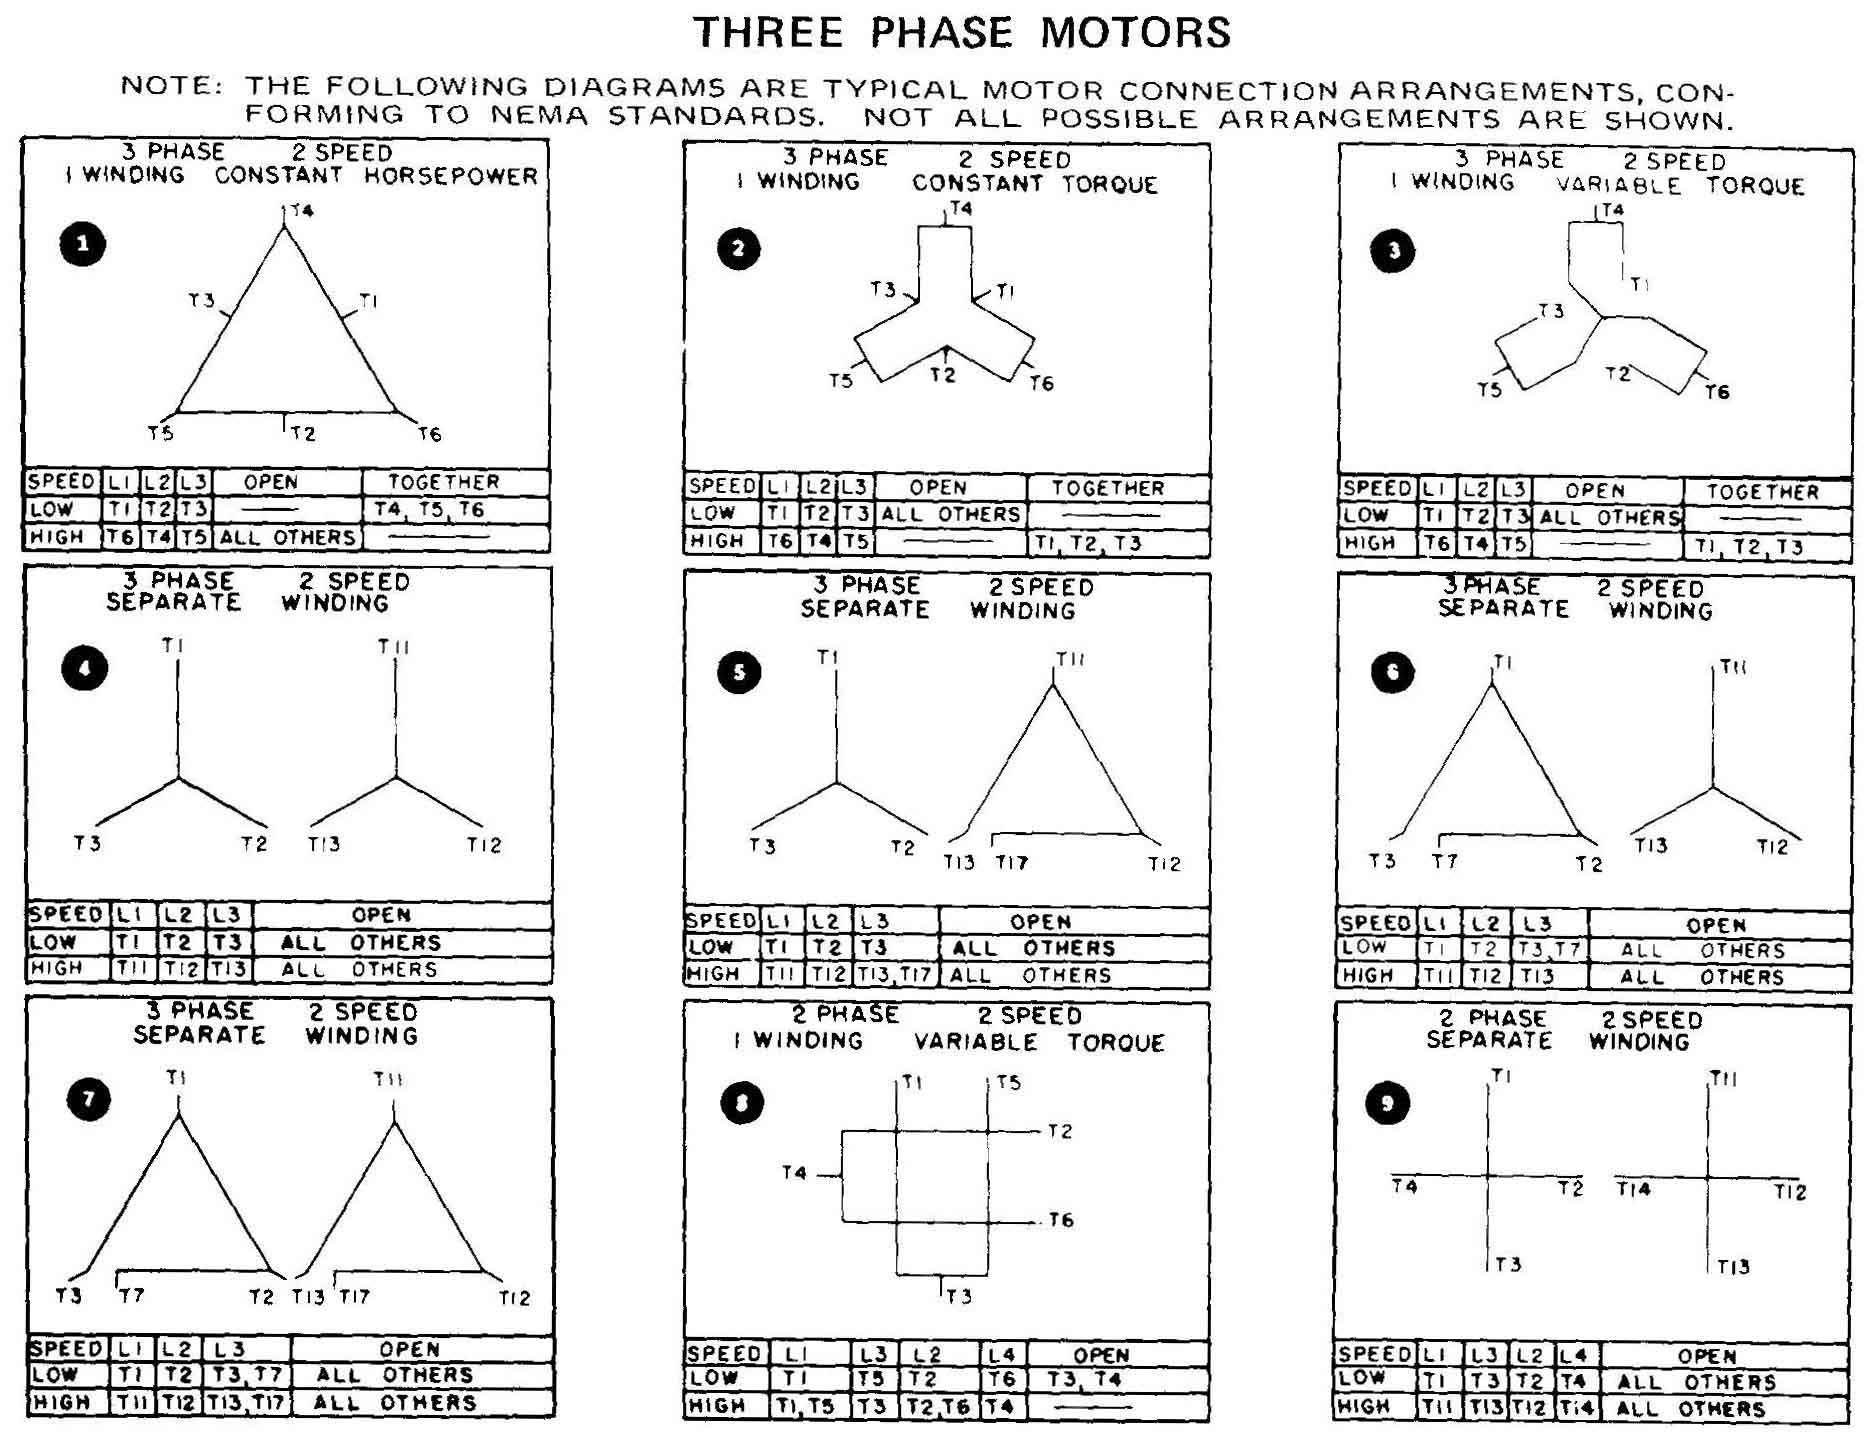 Pleasant Interpreting The Wiring Diagrams Tables Wiring Cloud Ittabisraaidewilluminateatxorg